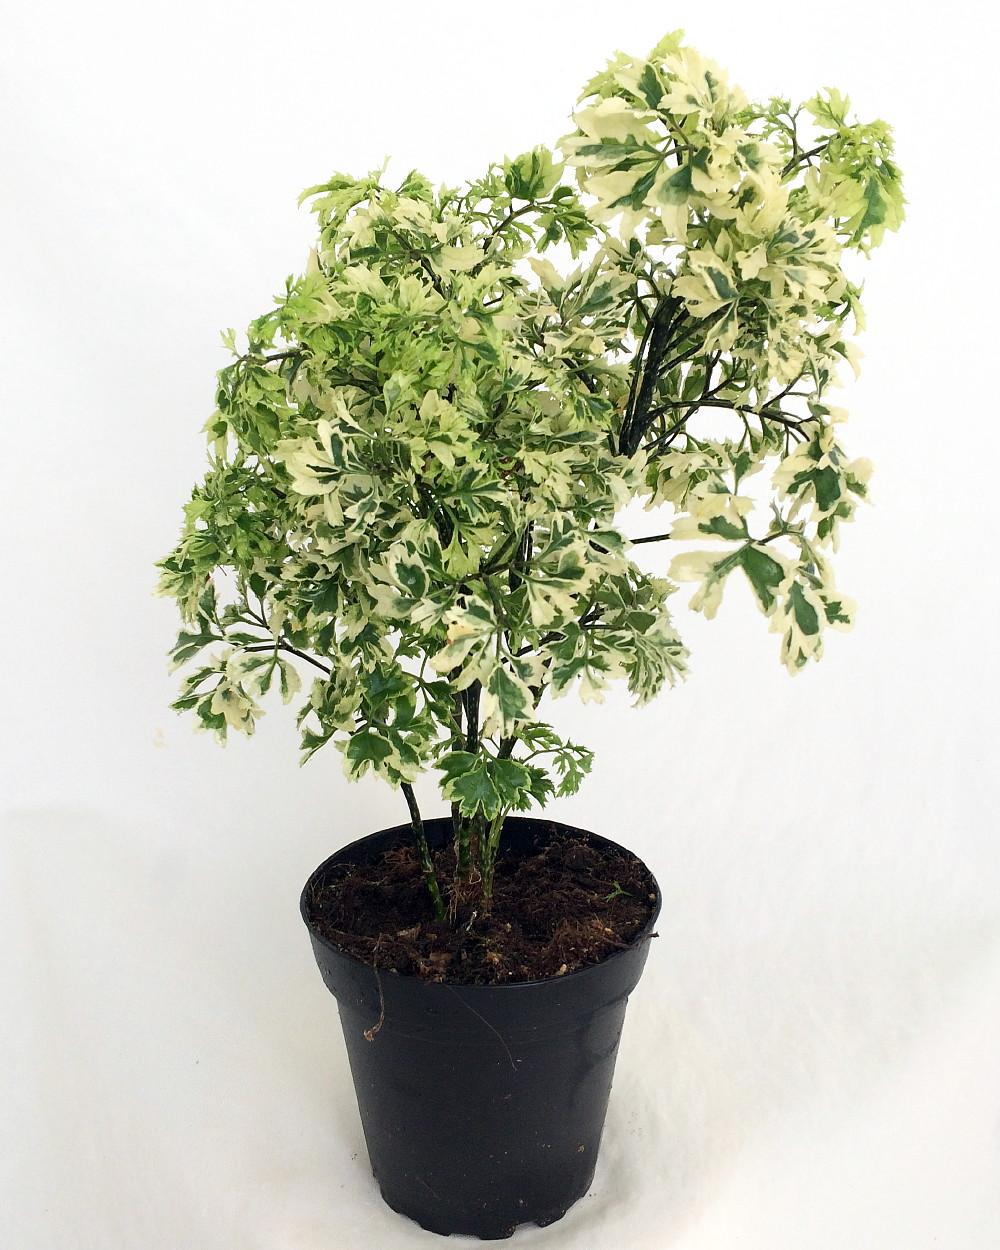 "Hirts: House Plant 'Snowflake' Ming Aralia Pre-Bonsai Tree - Polyscias fruticosa - Indoor - 4"" Pot at Sears.com"